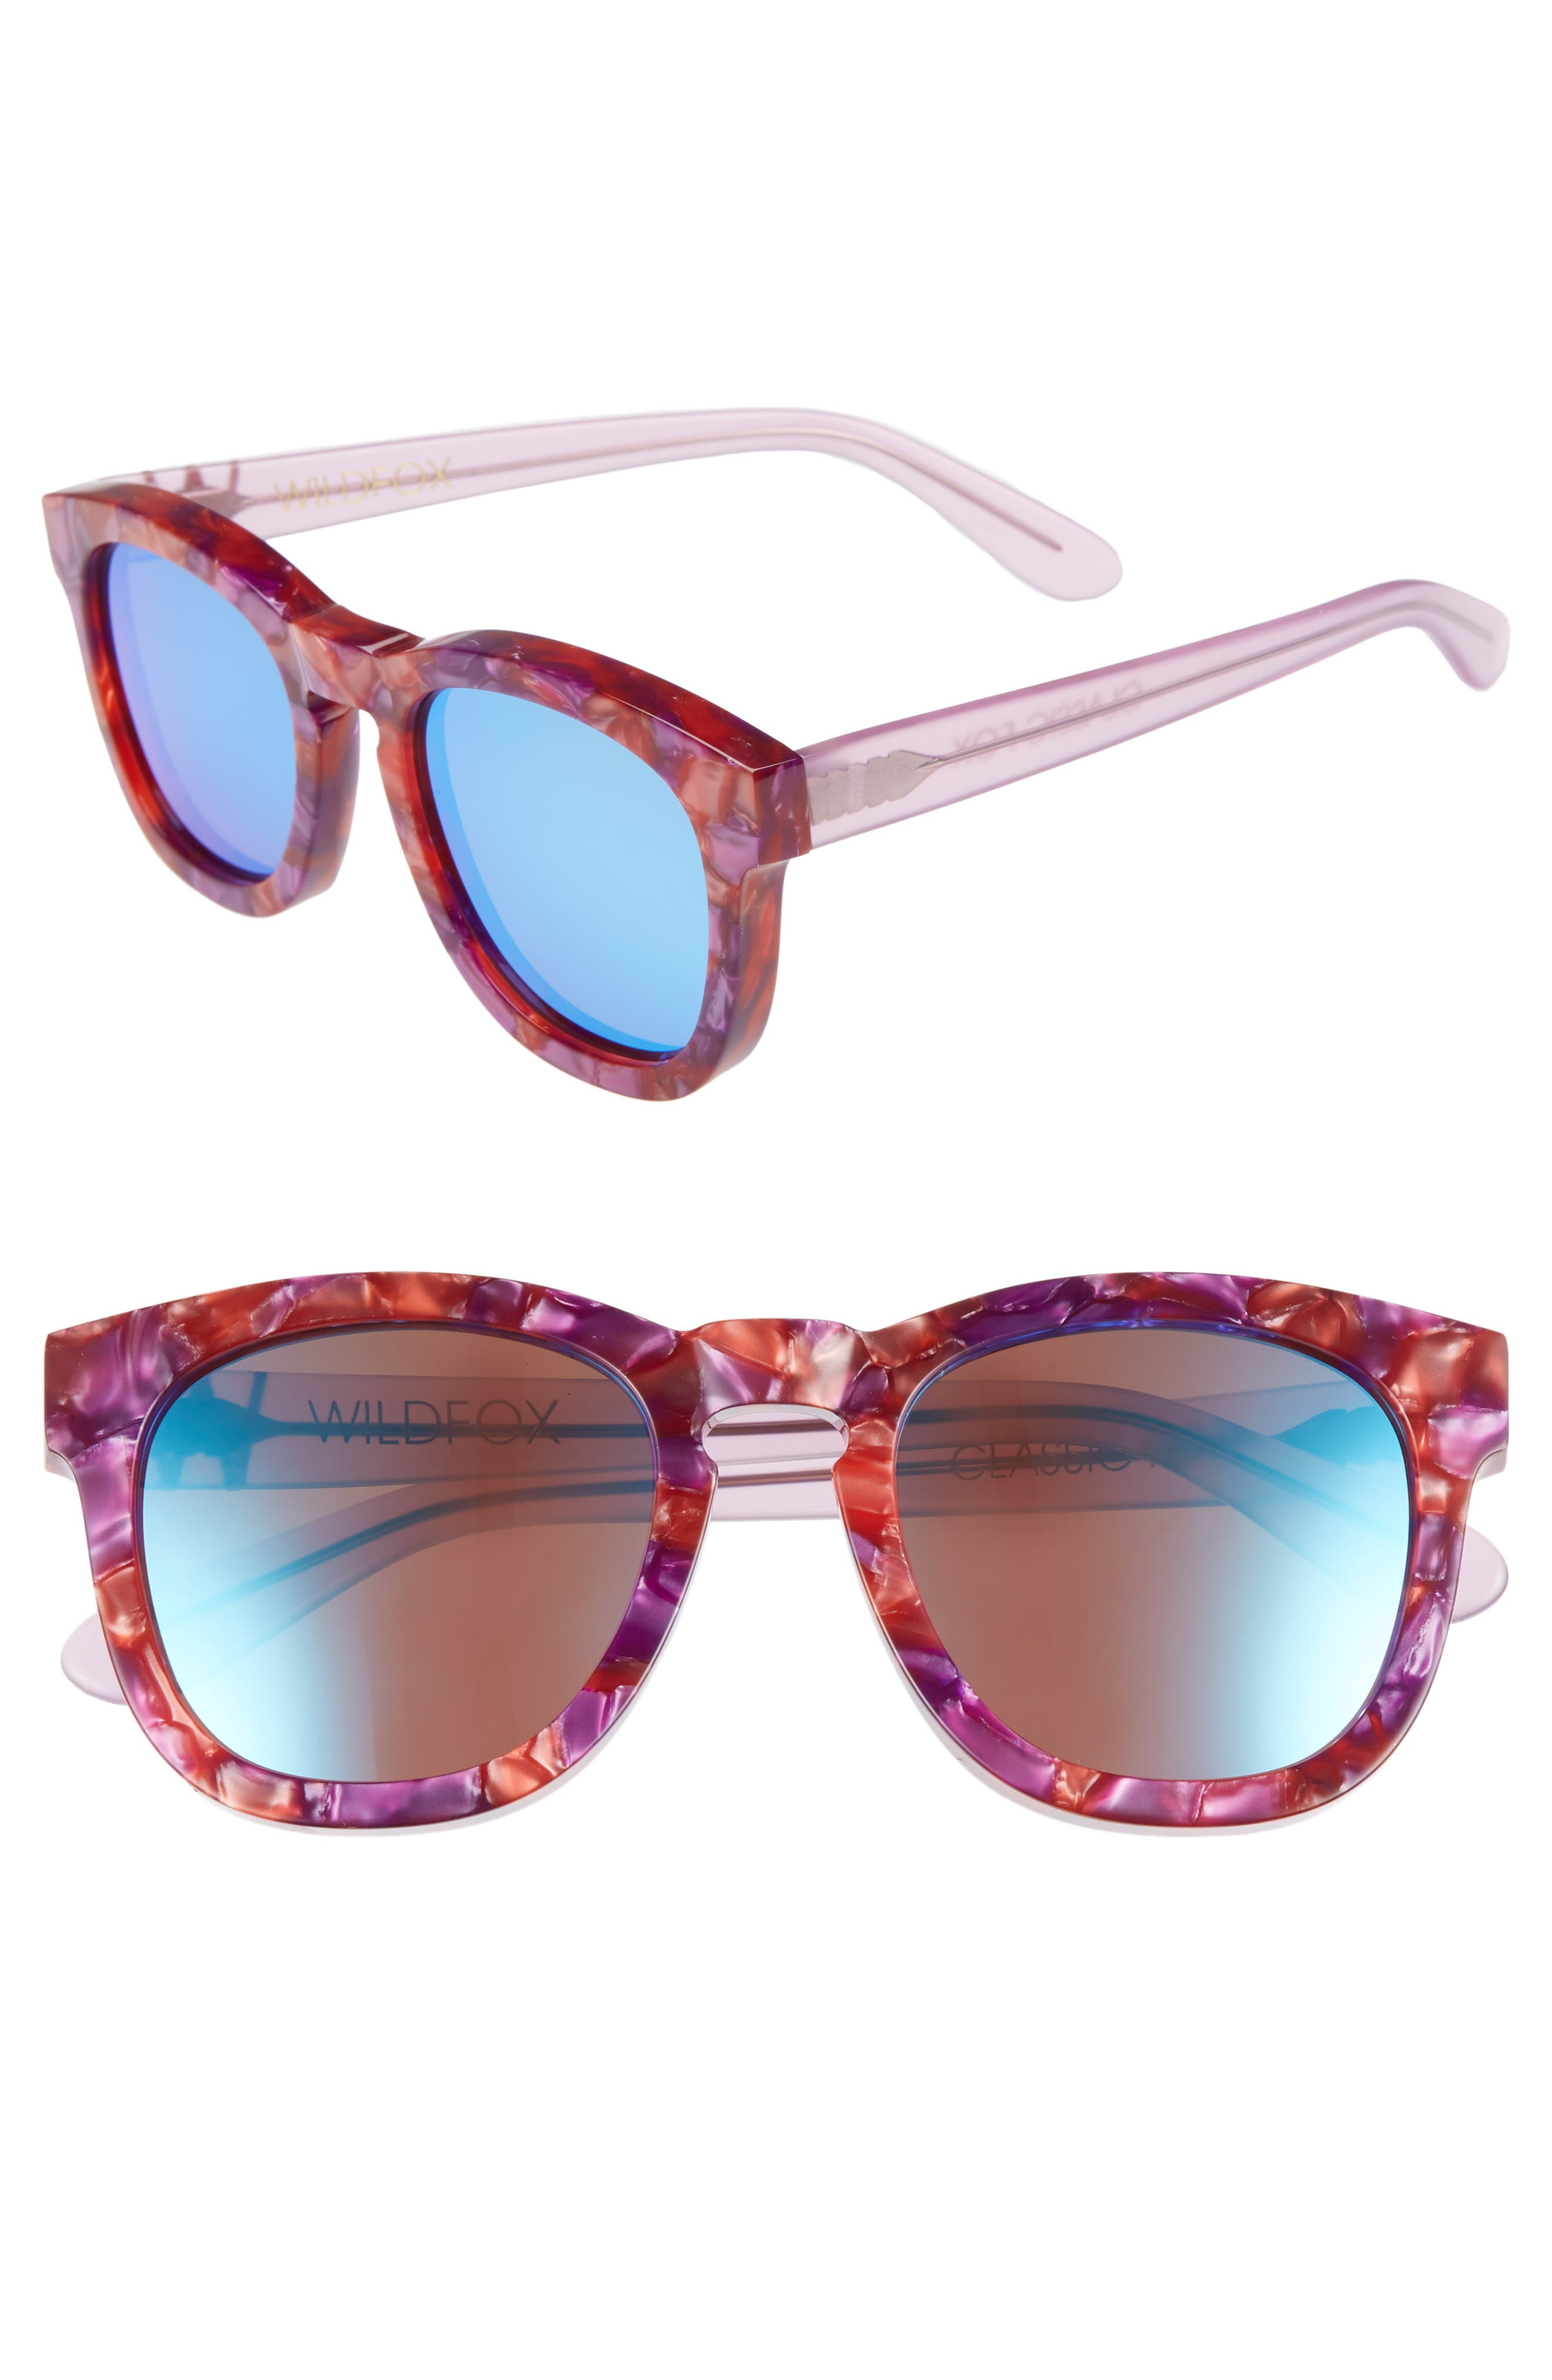 Wildfox Classic Fox - Deluxe 5m Sunglasses - Wildflower/blue Mirror